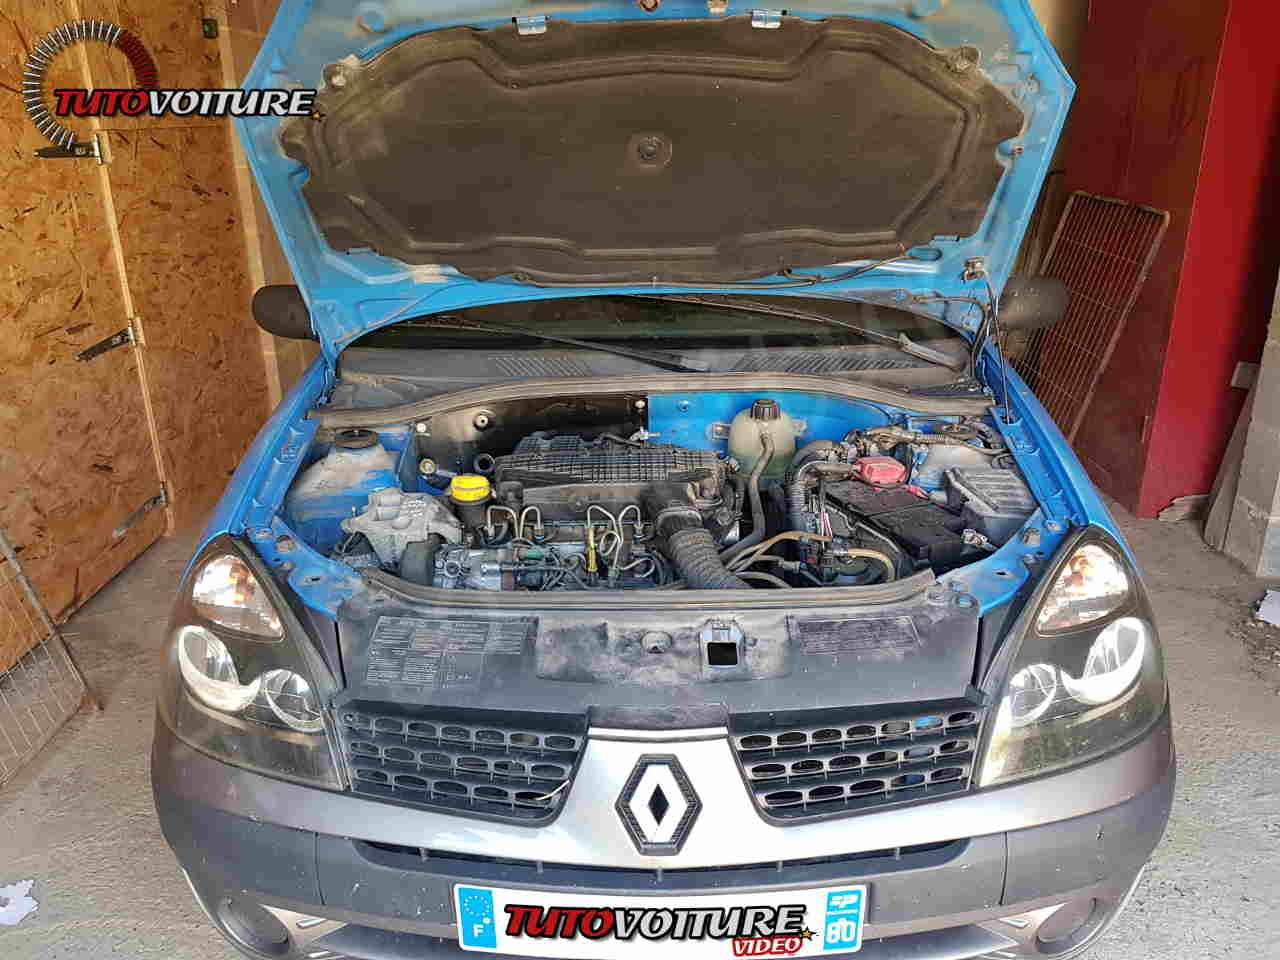 faire sa vidange - Renault Clio 2